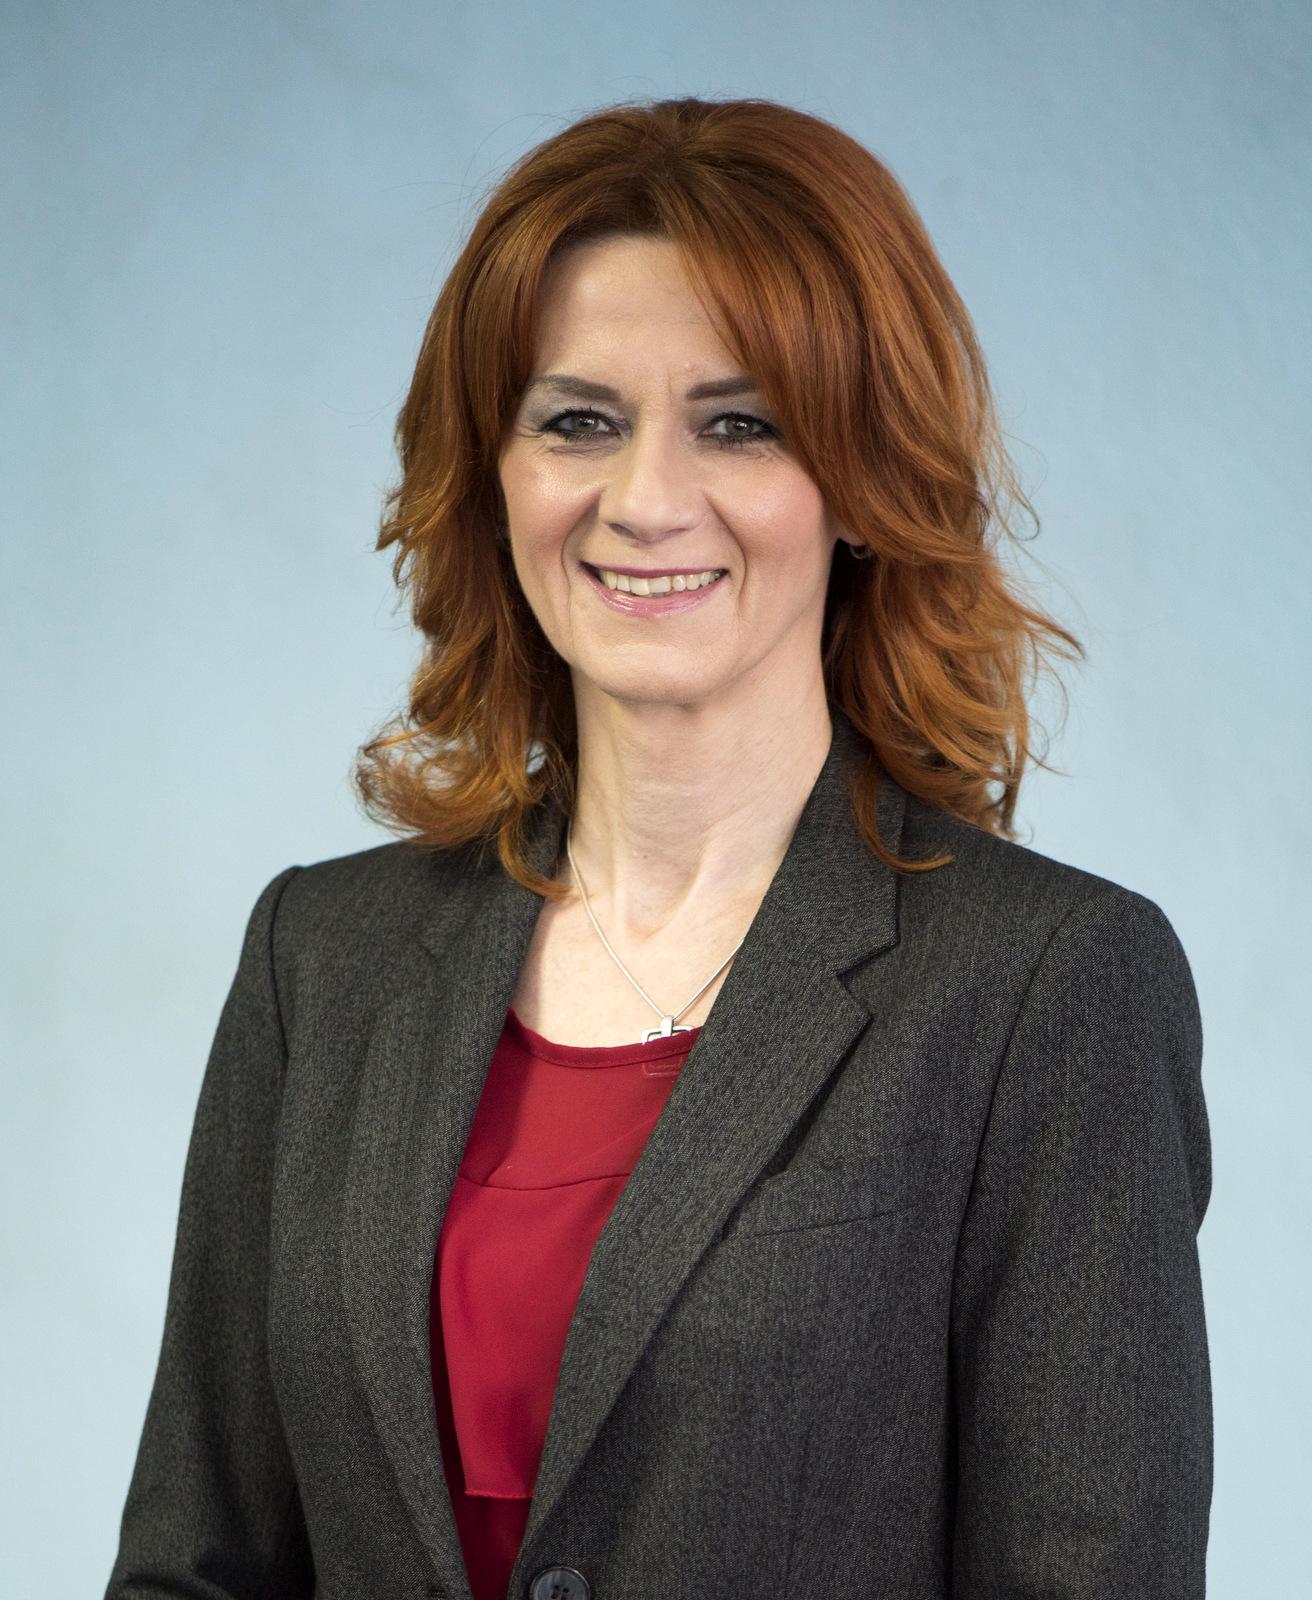 Martina Furdek-Hajdin